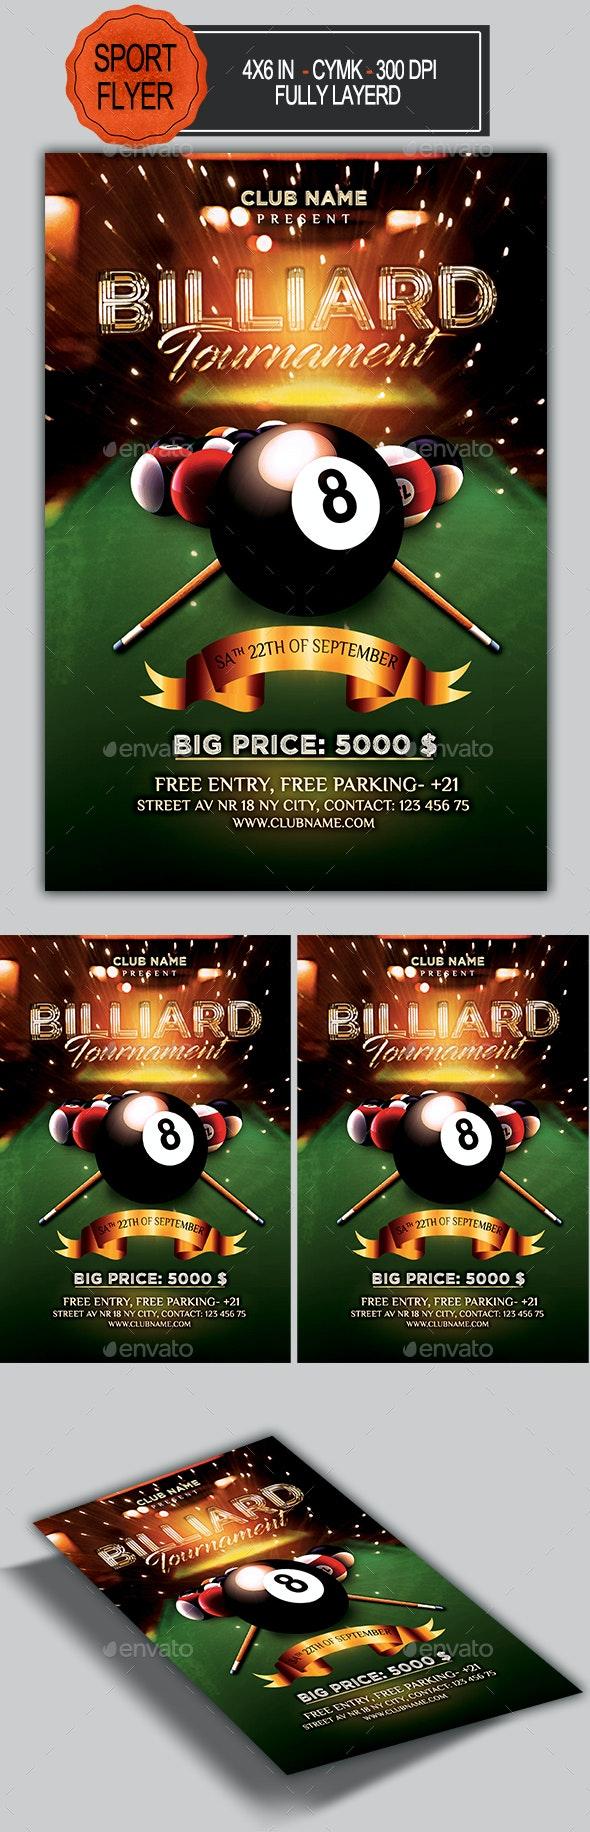 Billiard Tournament Flyer - Sports Events